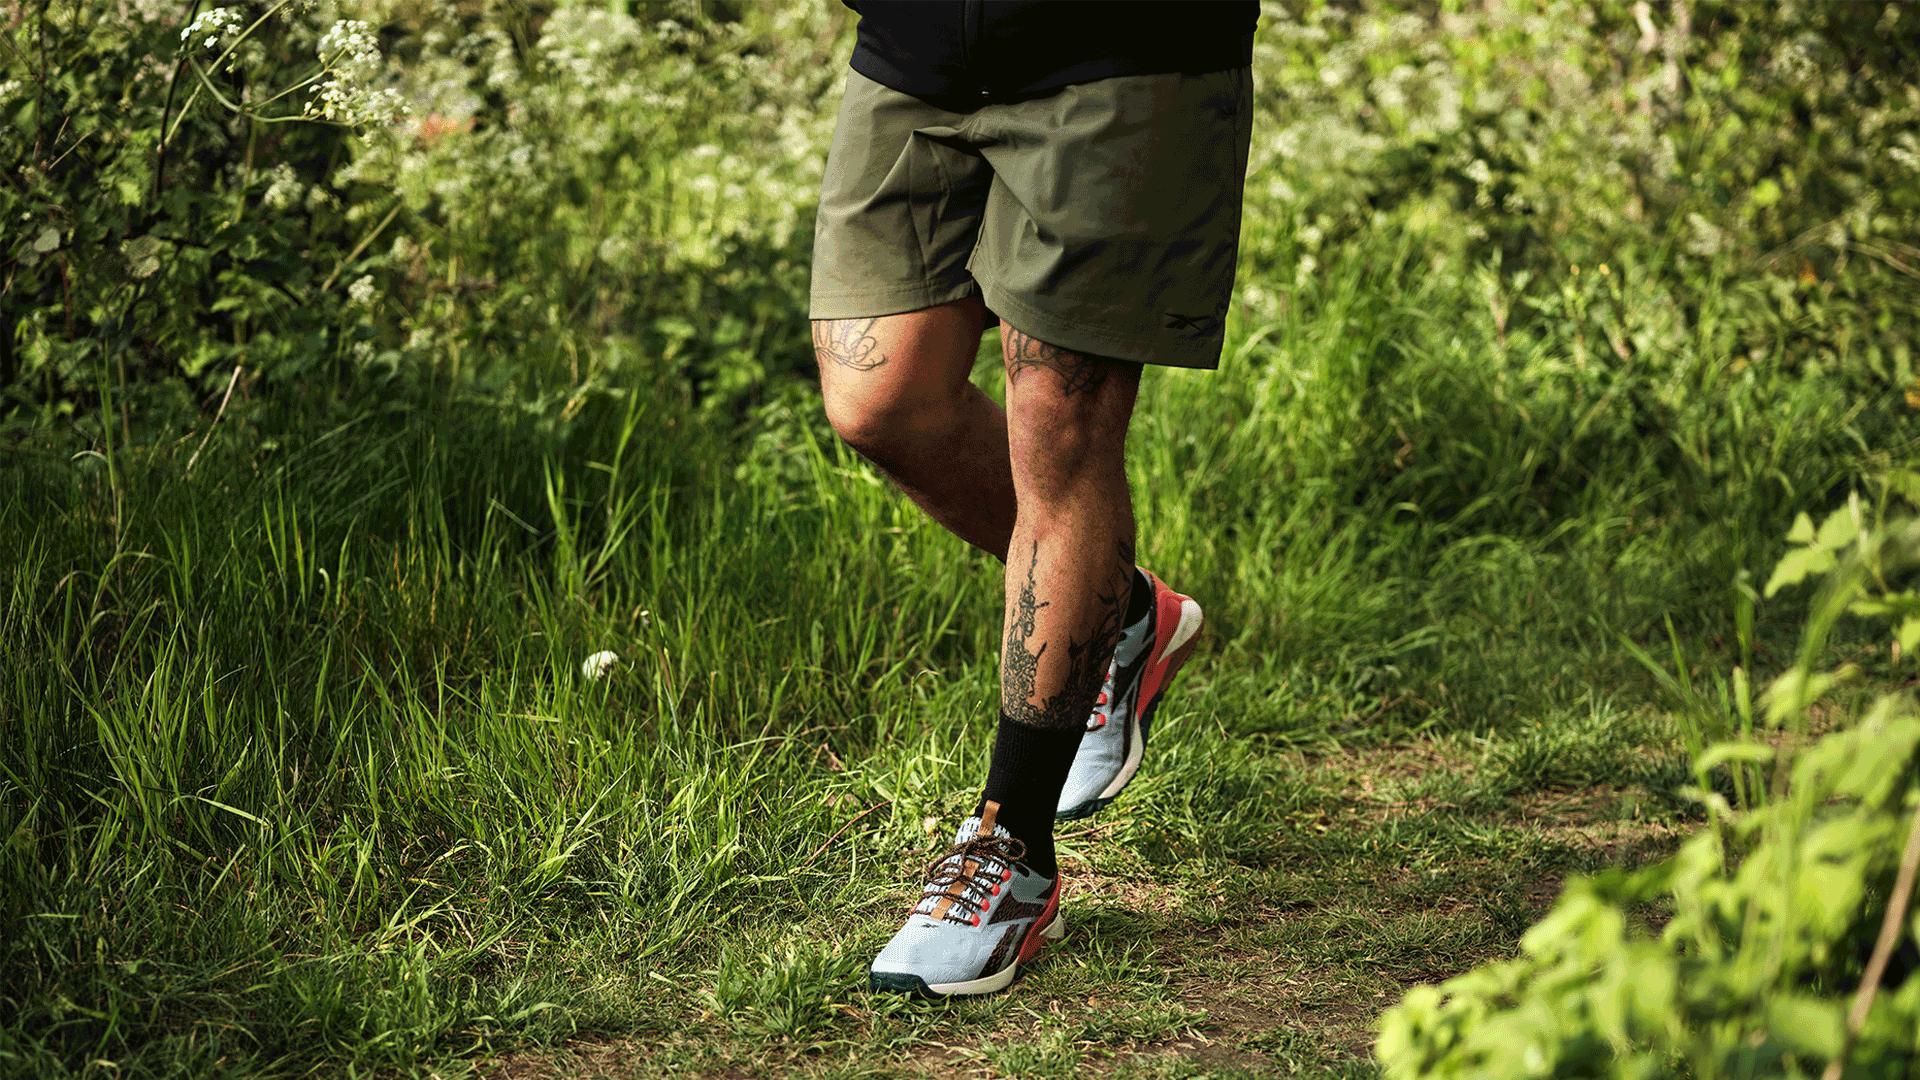 Reebok's Nano X1 Adventure training shoe | Running outdoors